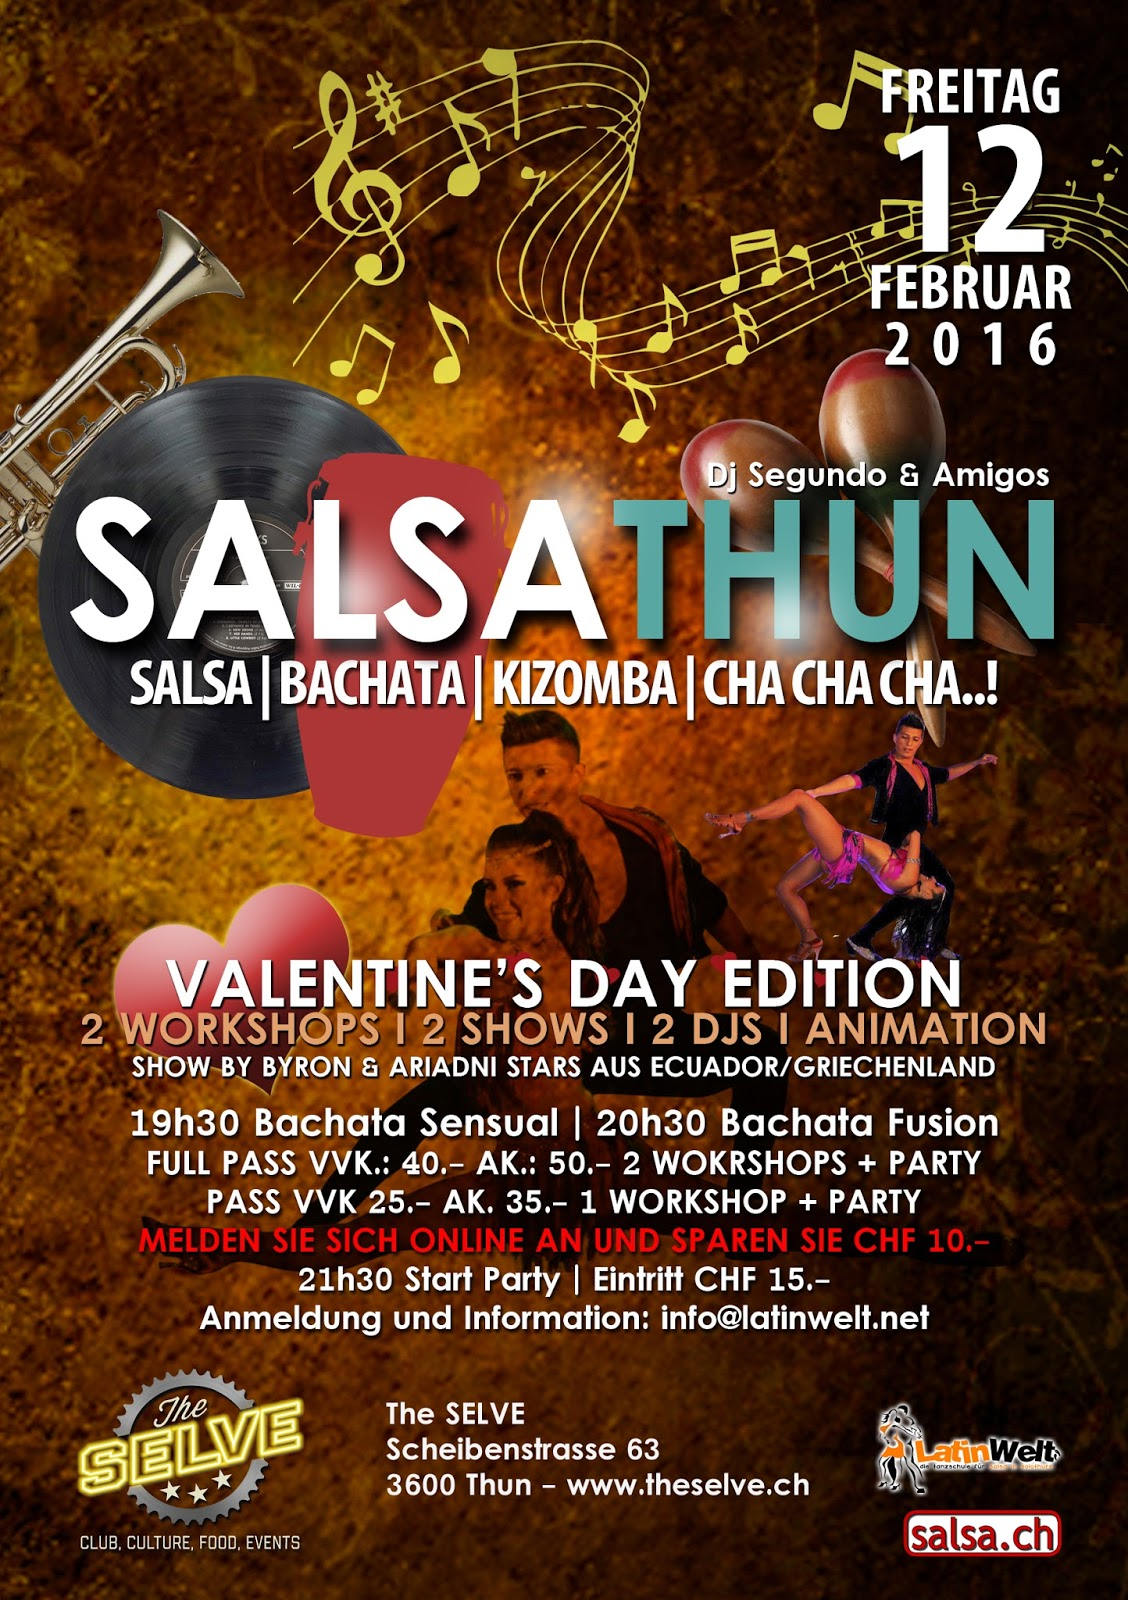 SALSATHUN PARTY 12.02.16